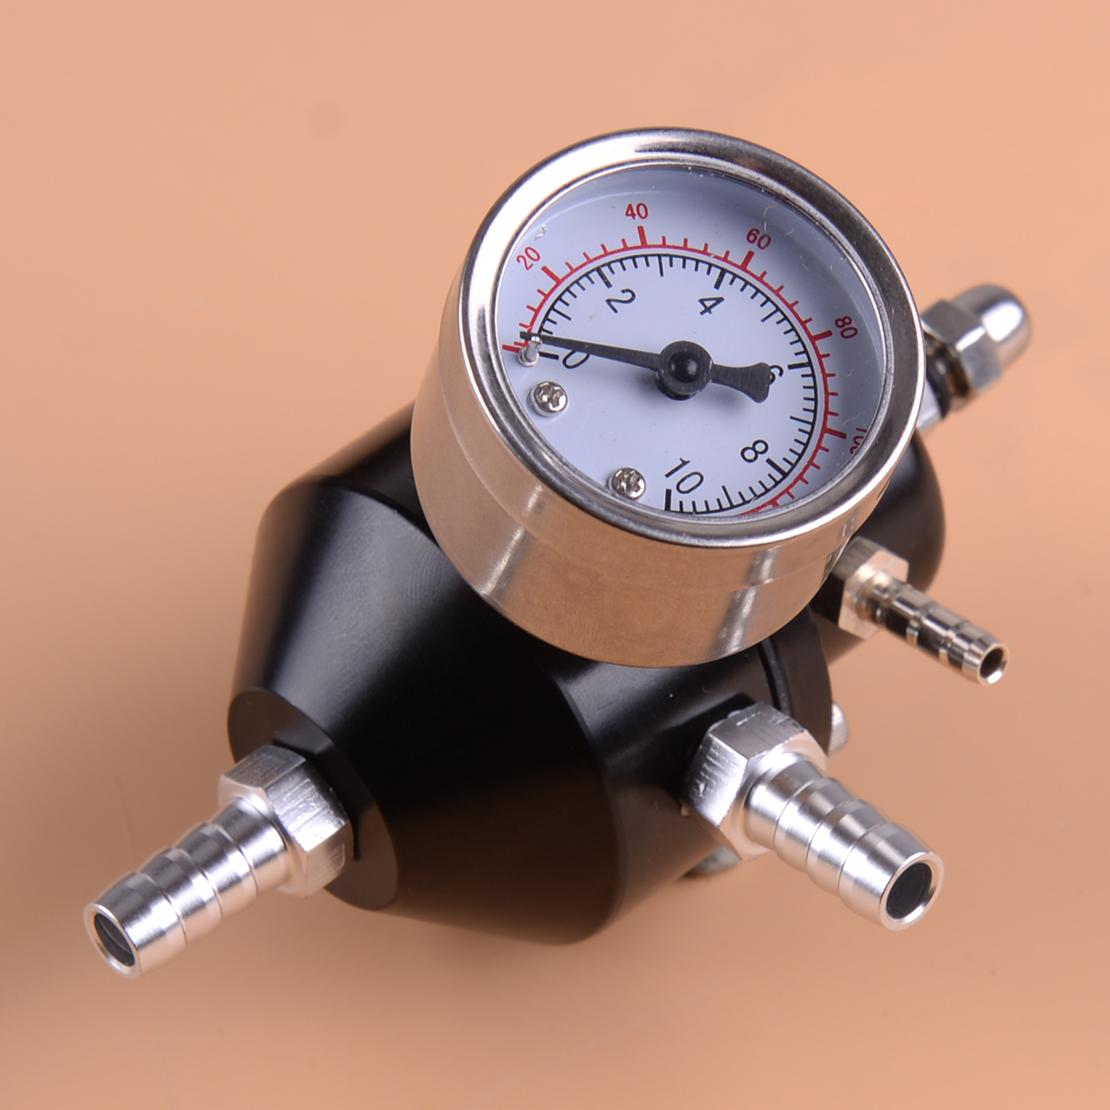 Universal Fuel Pressure Regulator with Gauge 0-140 Psi Adjustable Set